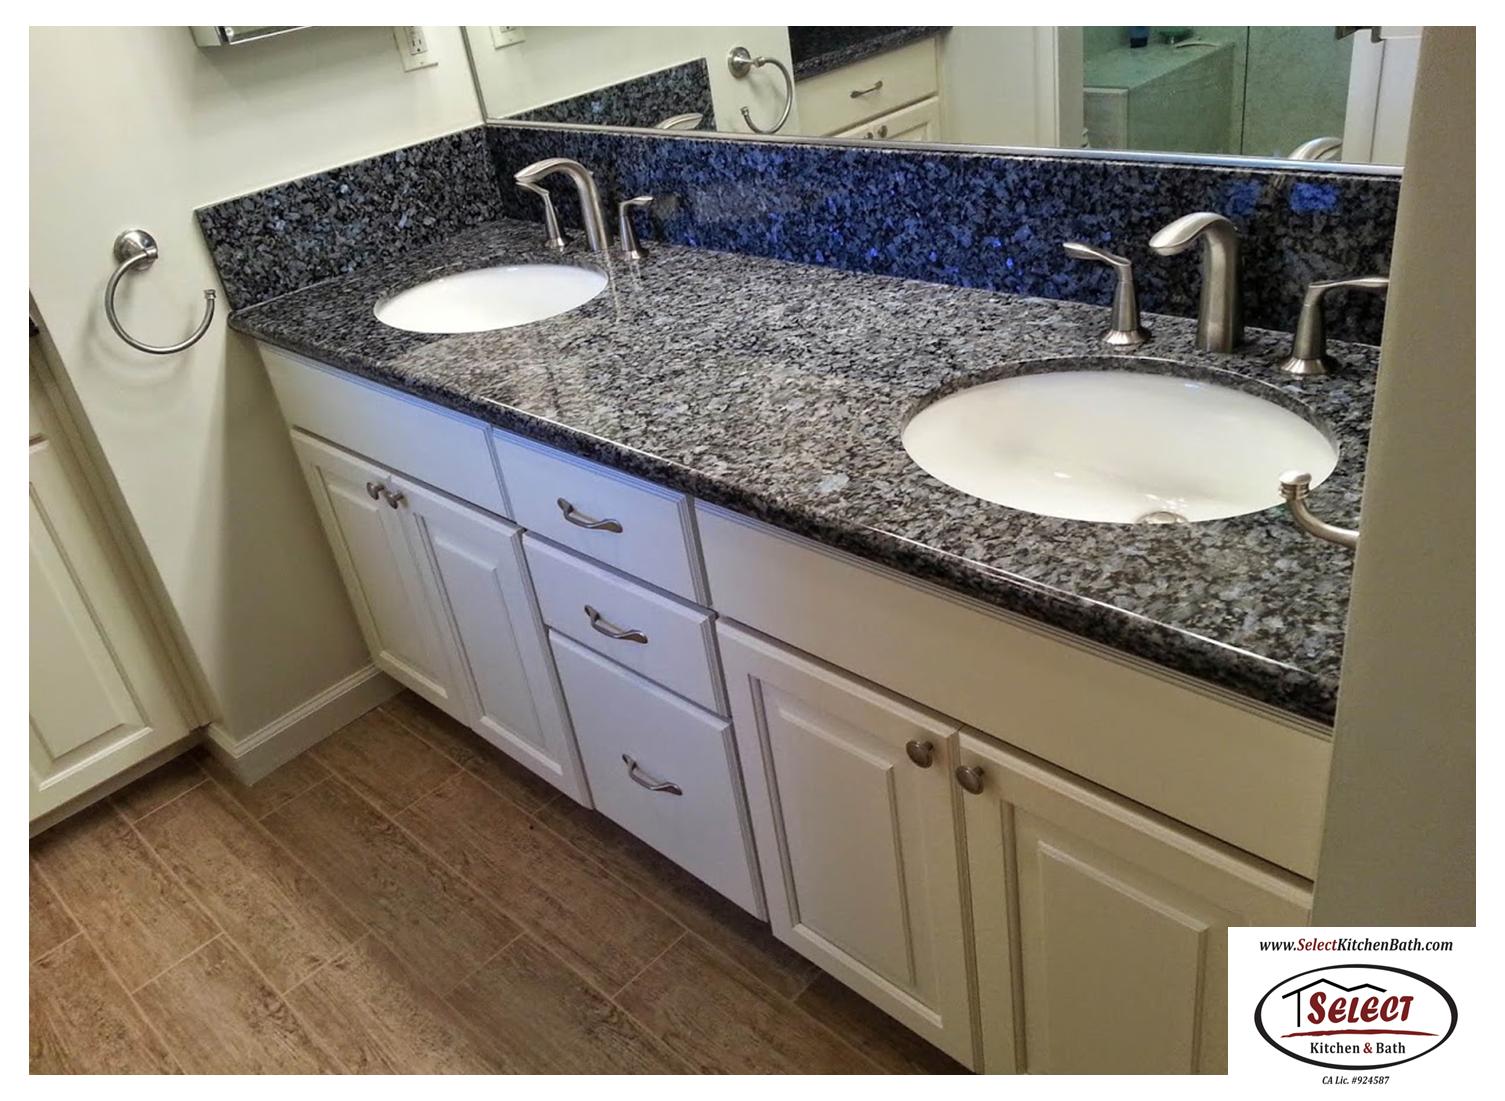 Beautiful Granite Bathroom Vanity Countertop Select Kitchen Bath Roseville Ca Kitchen Bathroom Remodel Vanity Countertop Kitchen And Bath